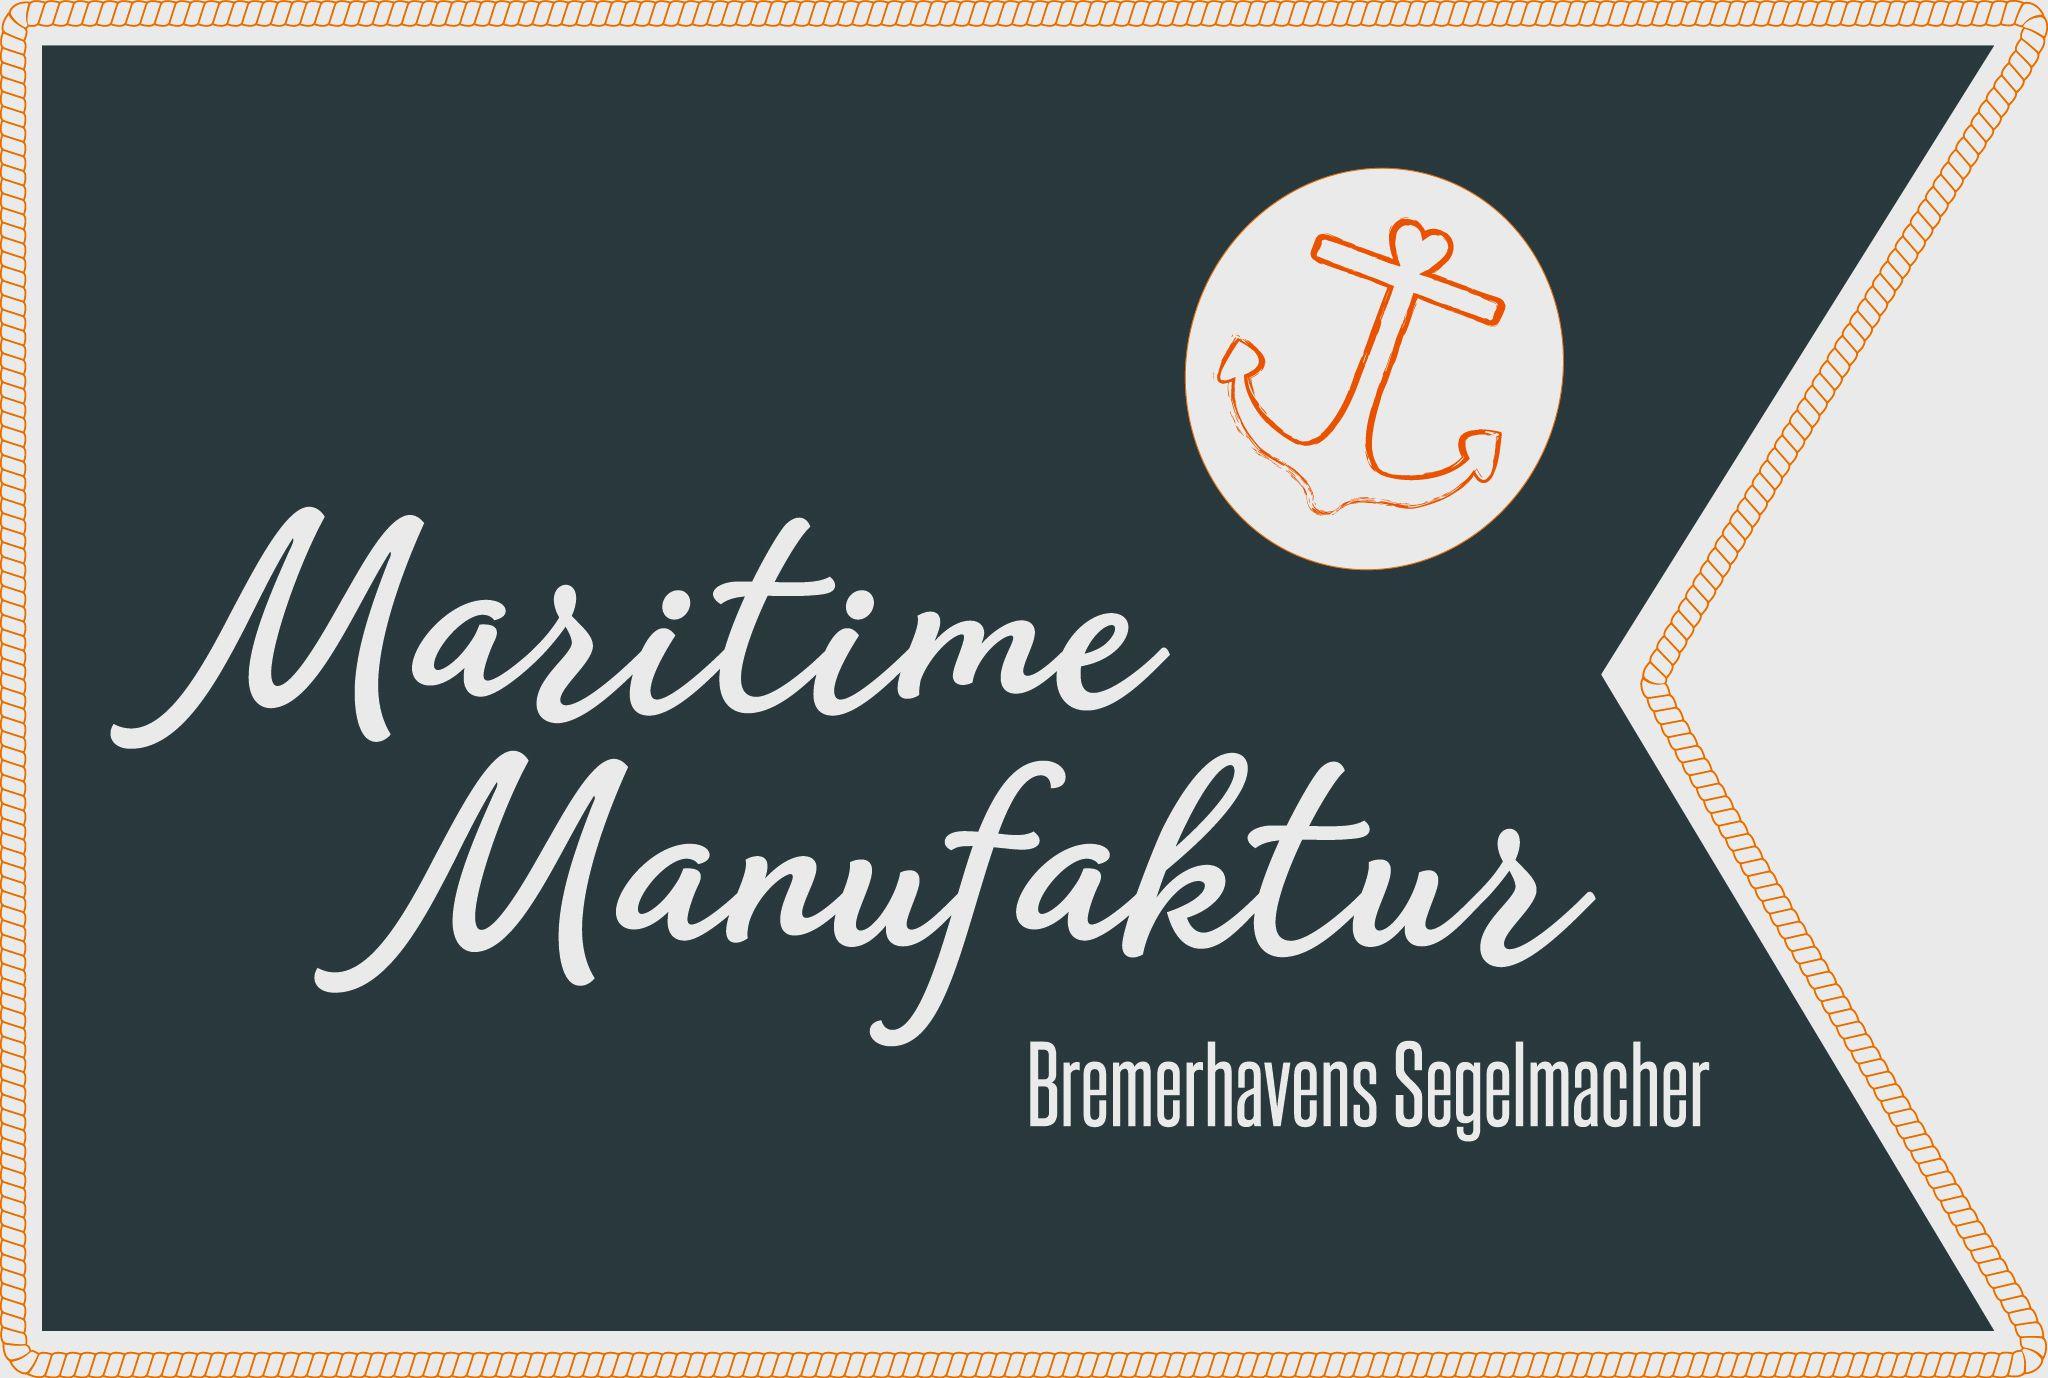 Bremerhavens Segelmacher / Maritime Manufaktur